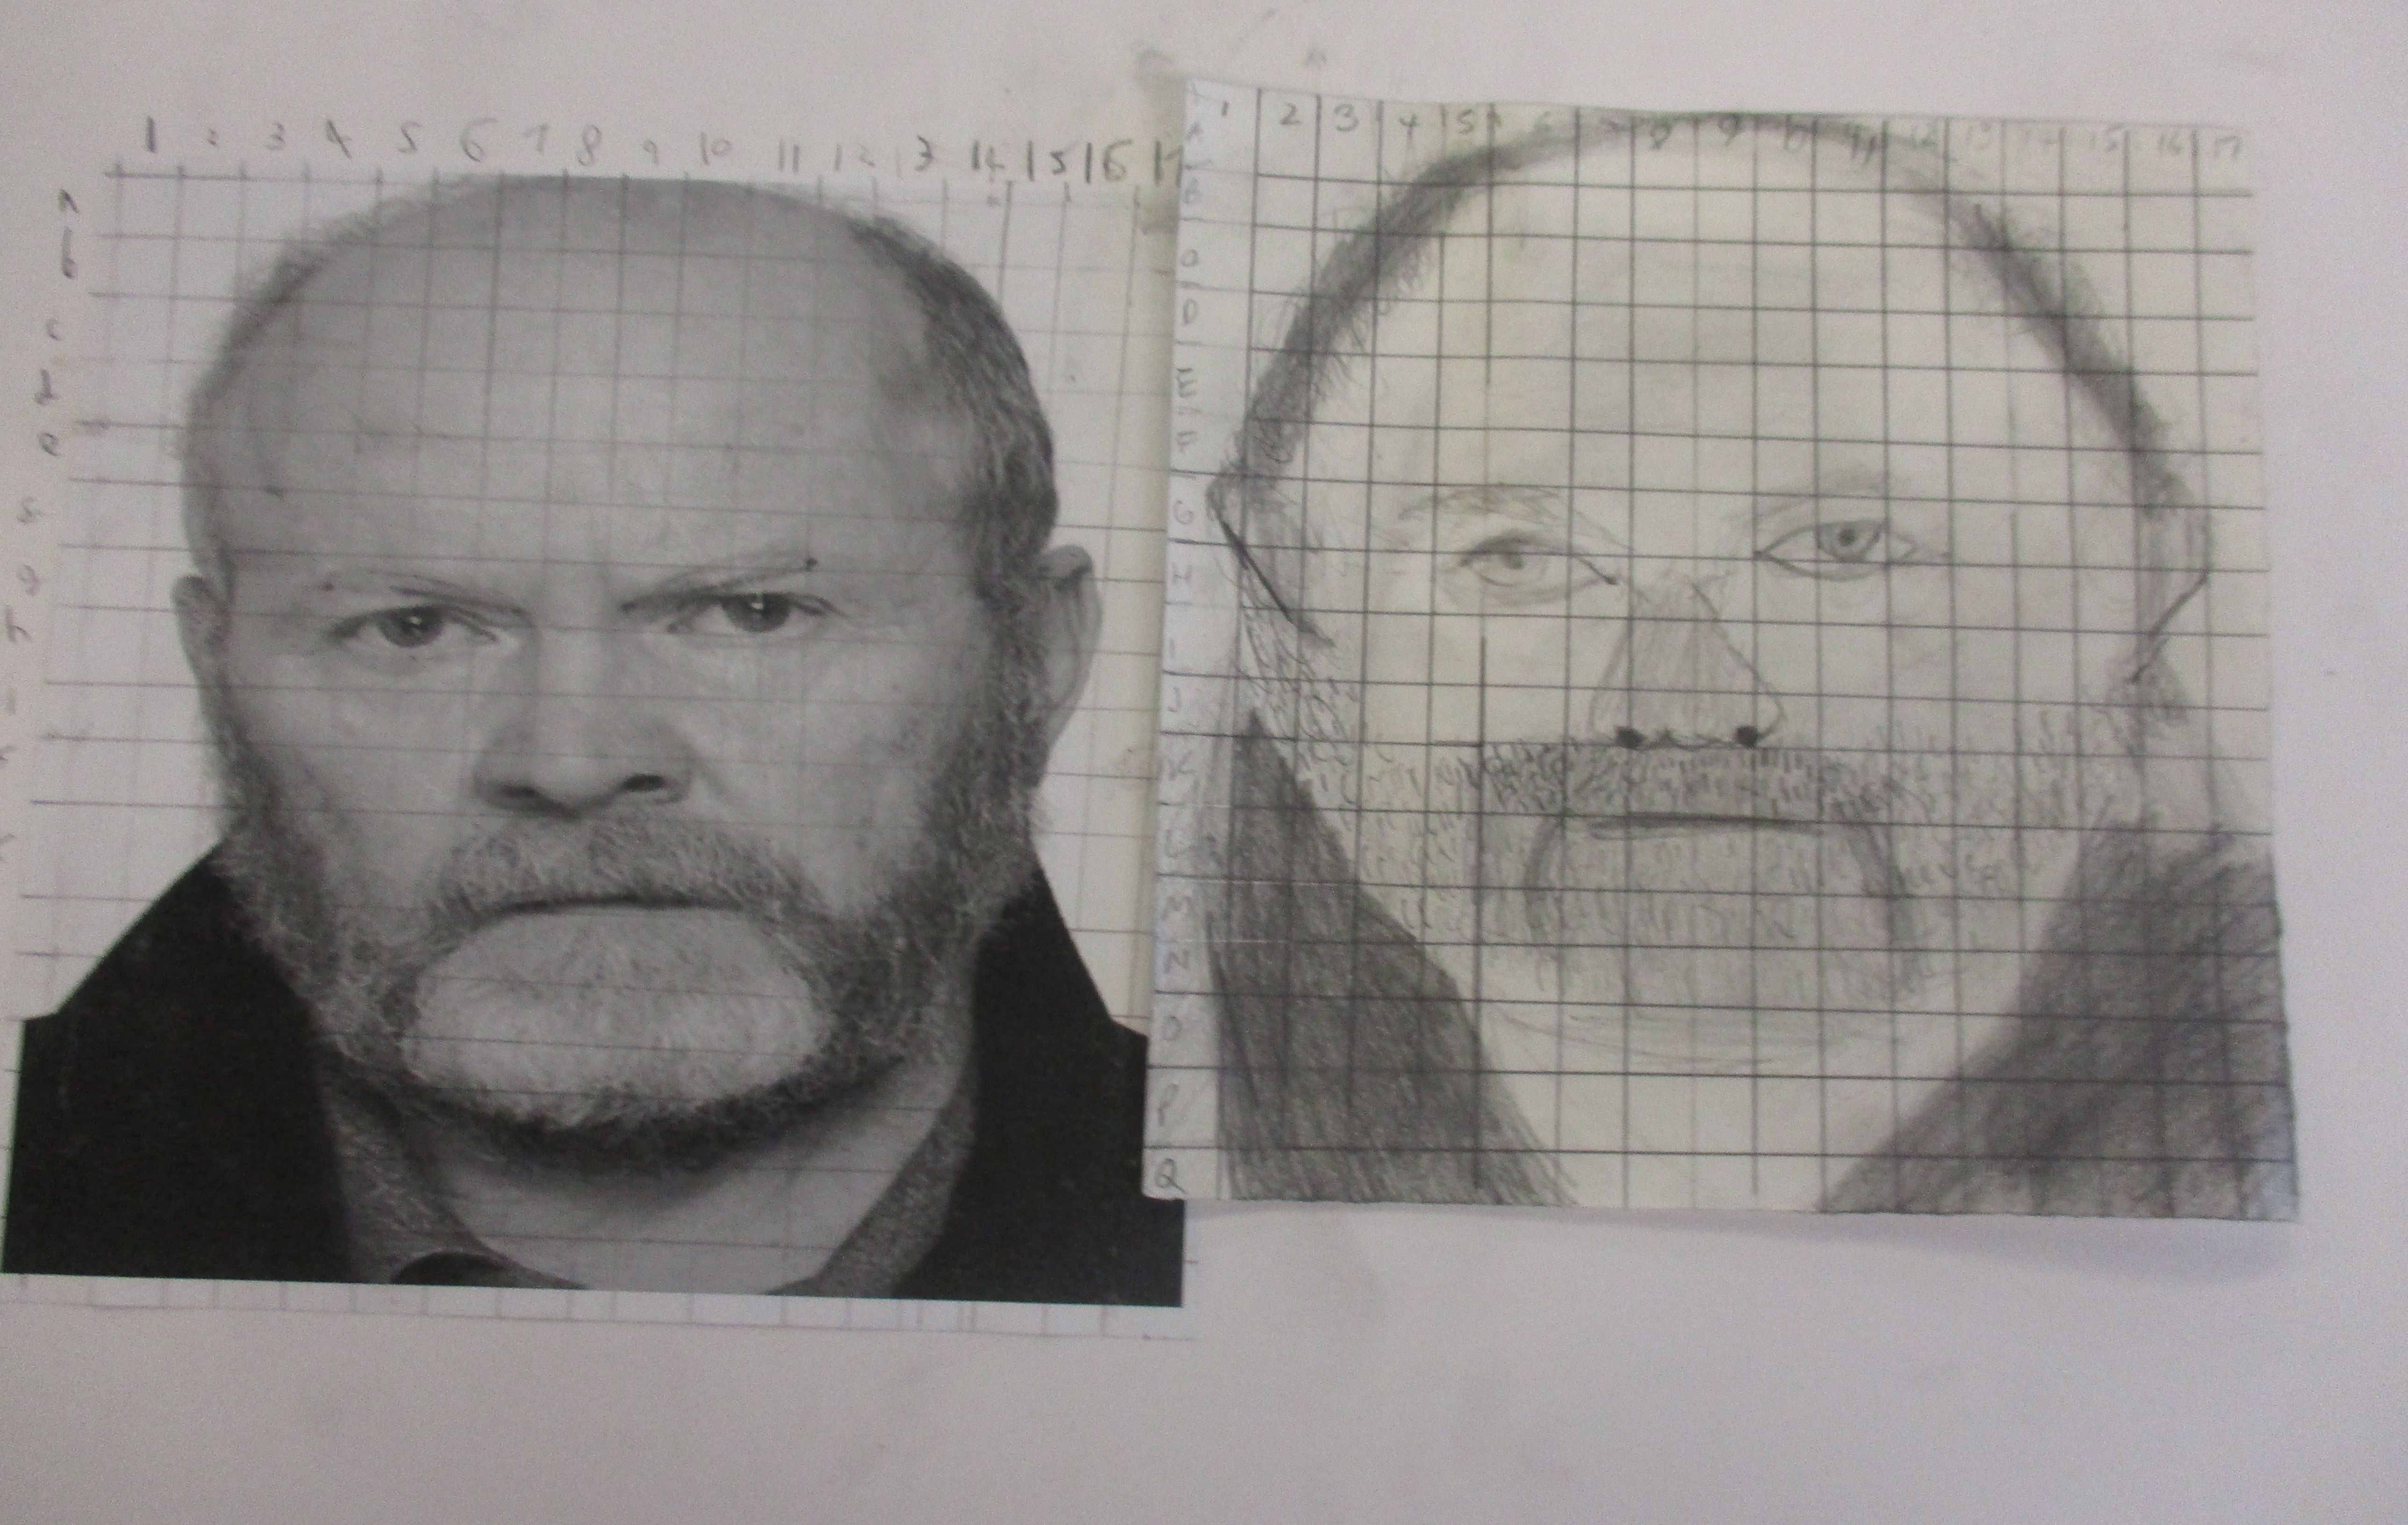 Tonal Drawings Of Portraits Using The Grid Method